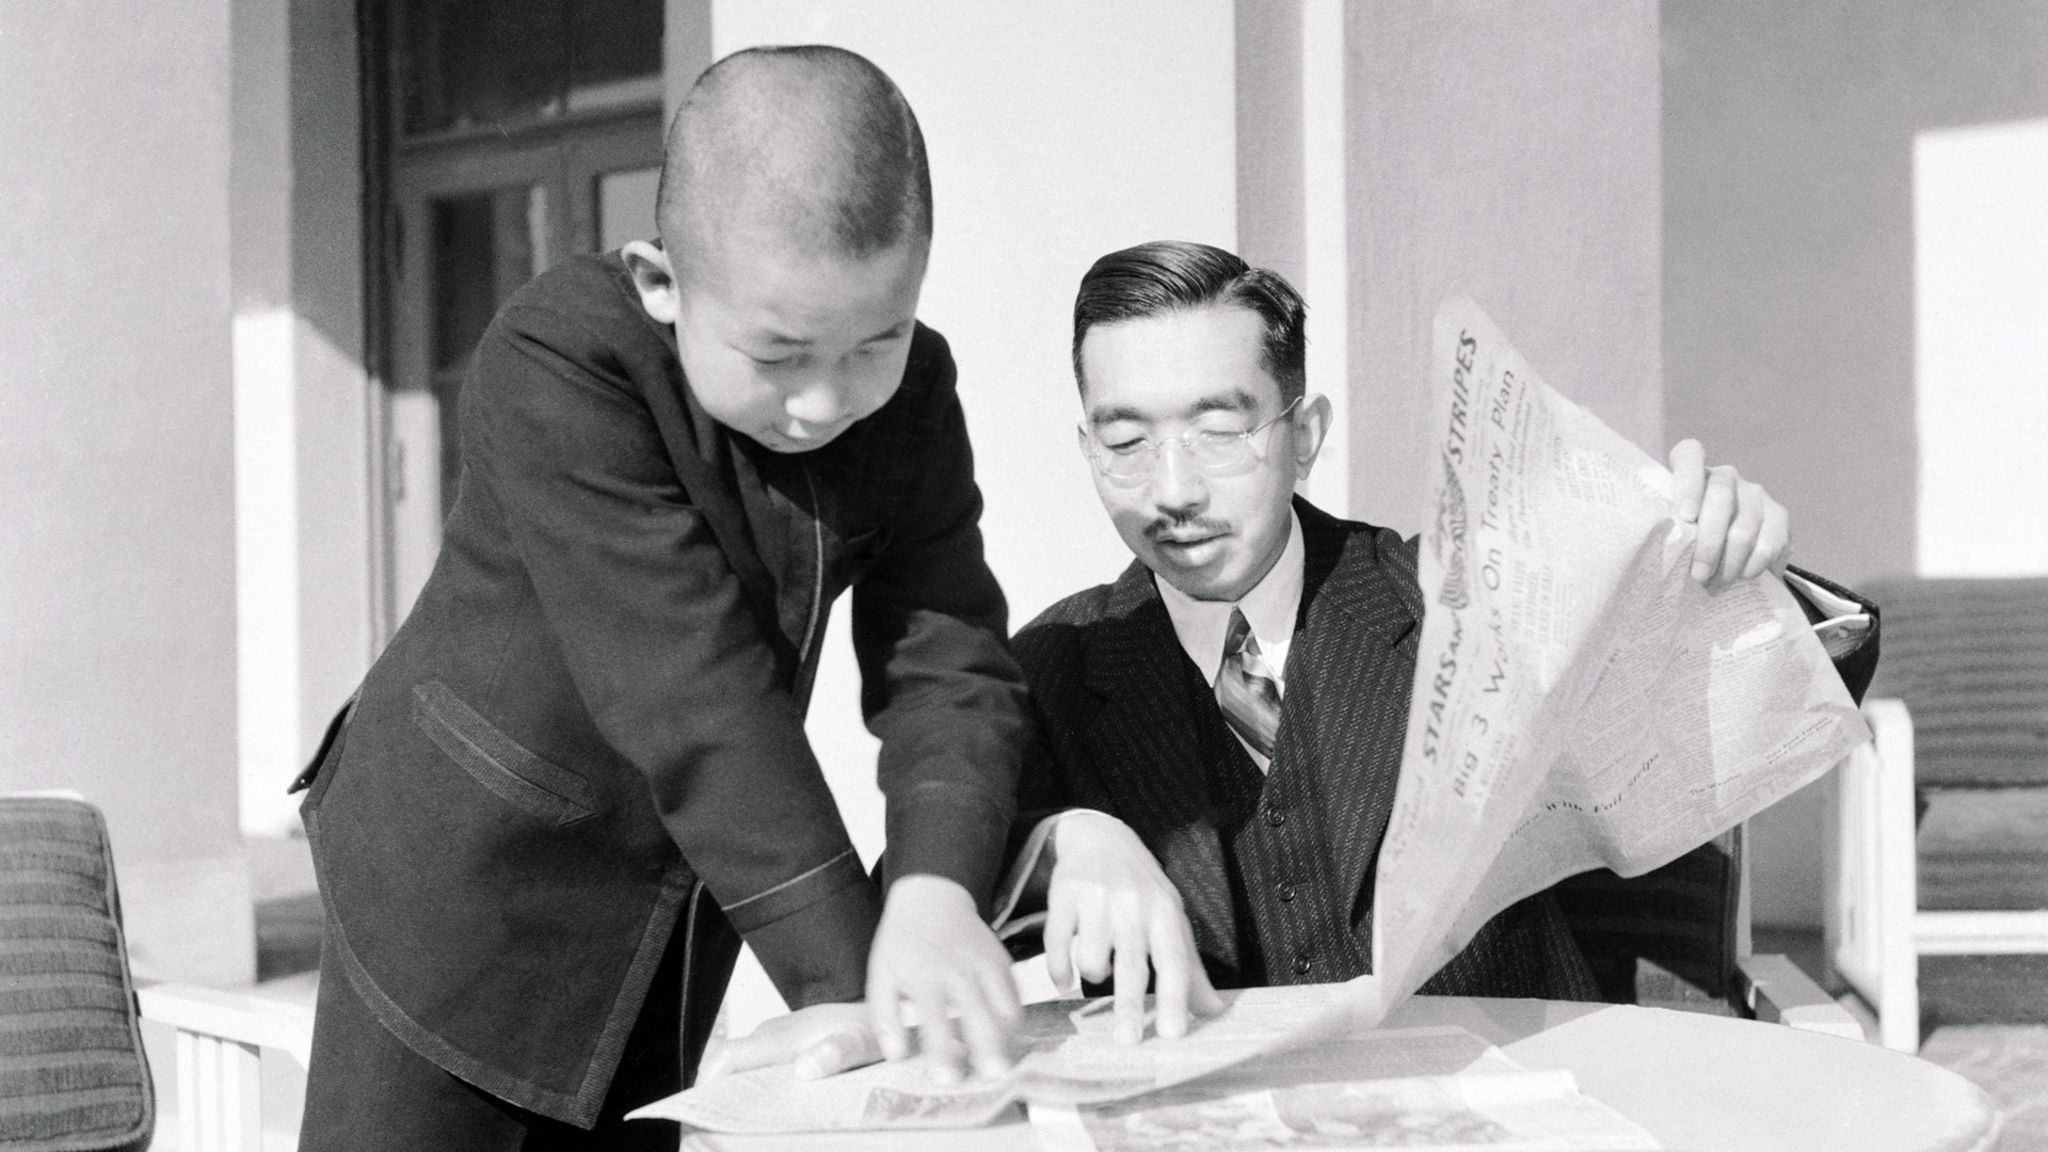 Emperor Hirohito and Prince Akihito reading a newspaper